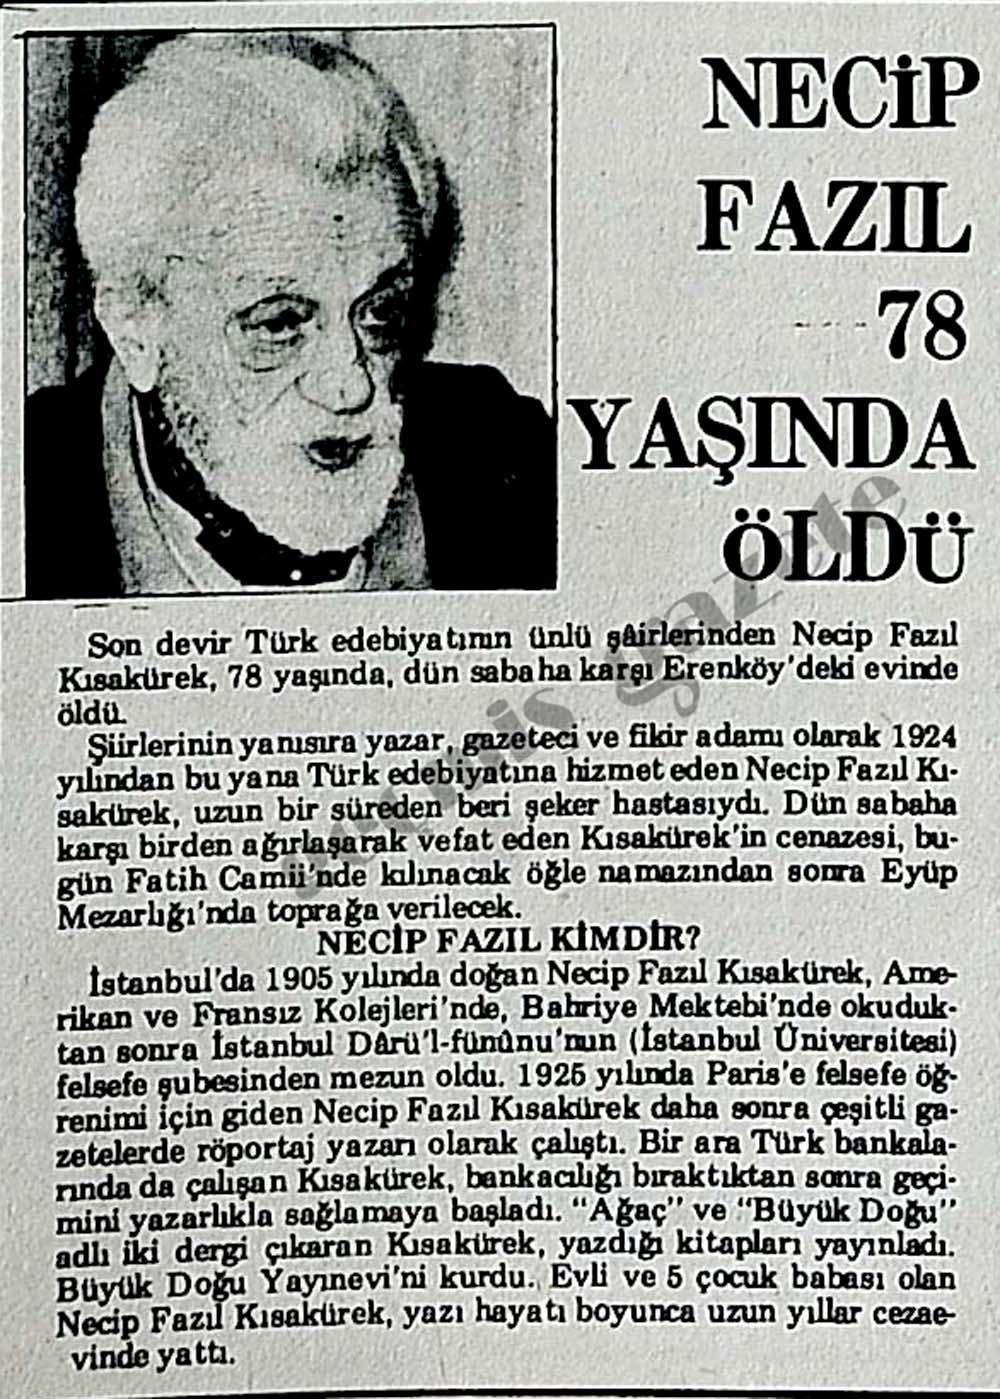 Necip Fazıl 78 yaşında öldü